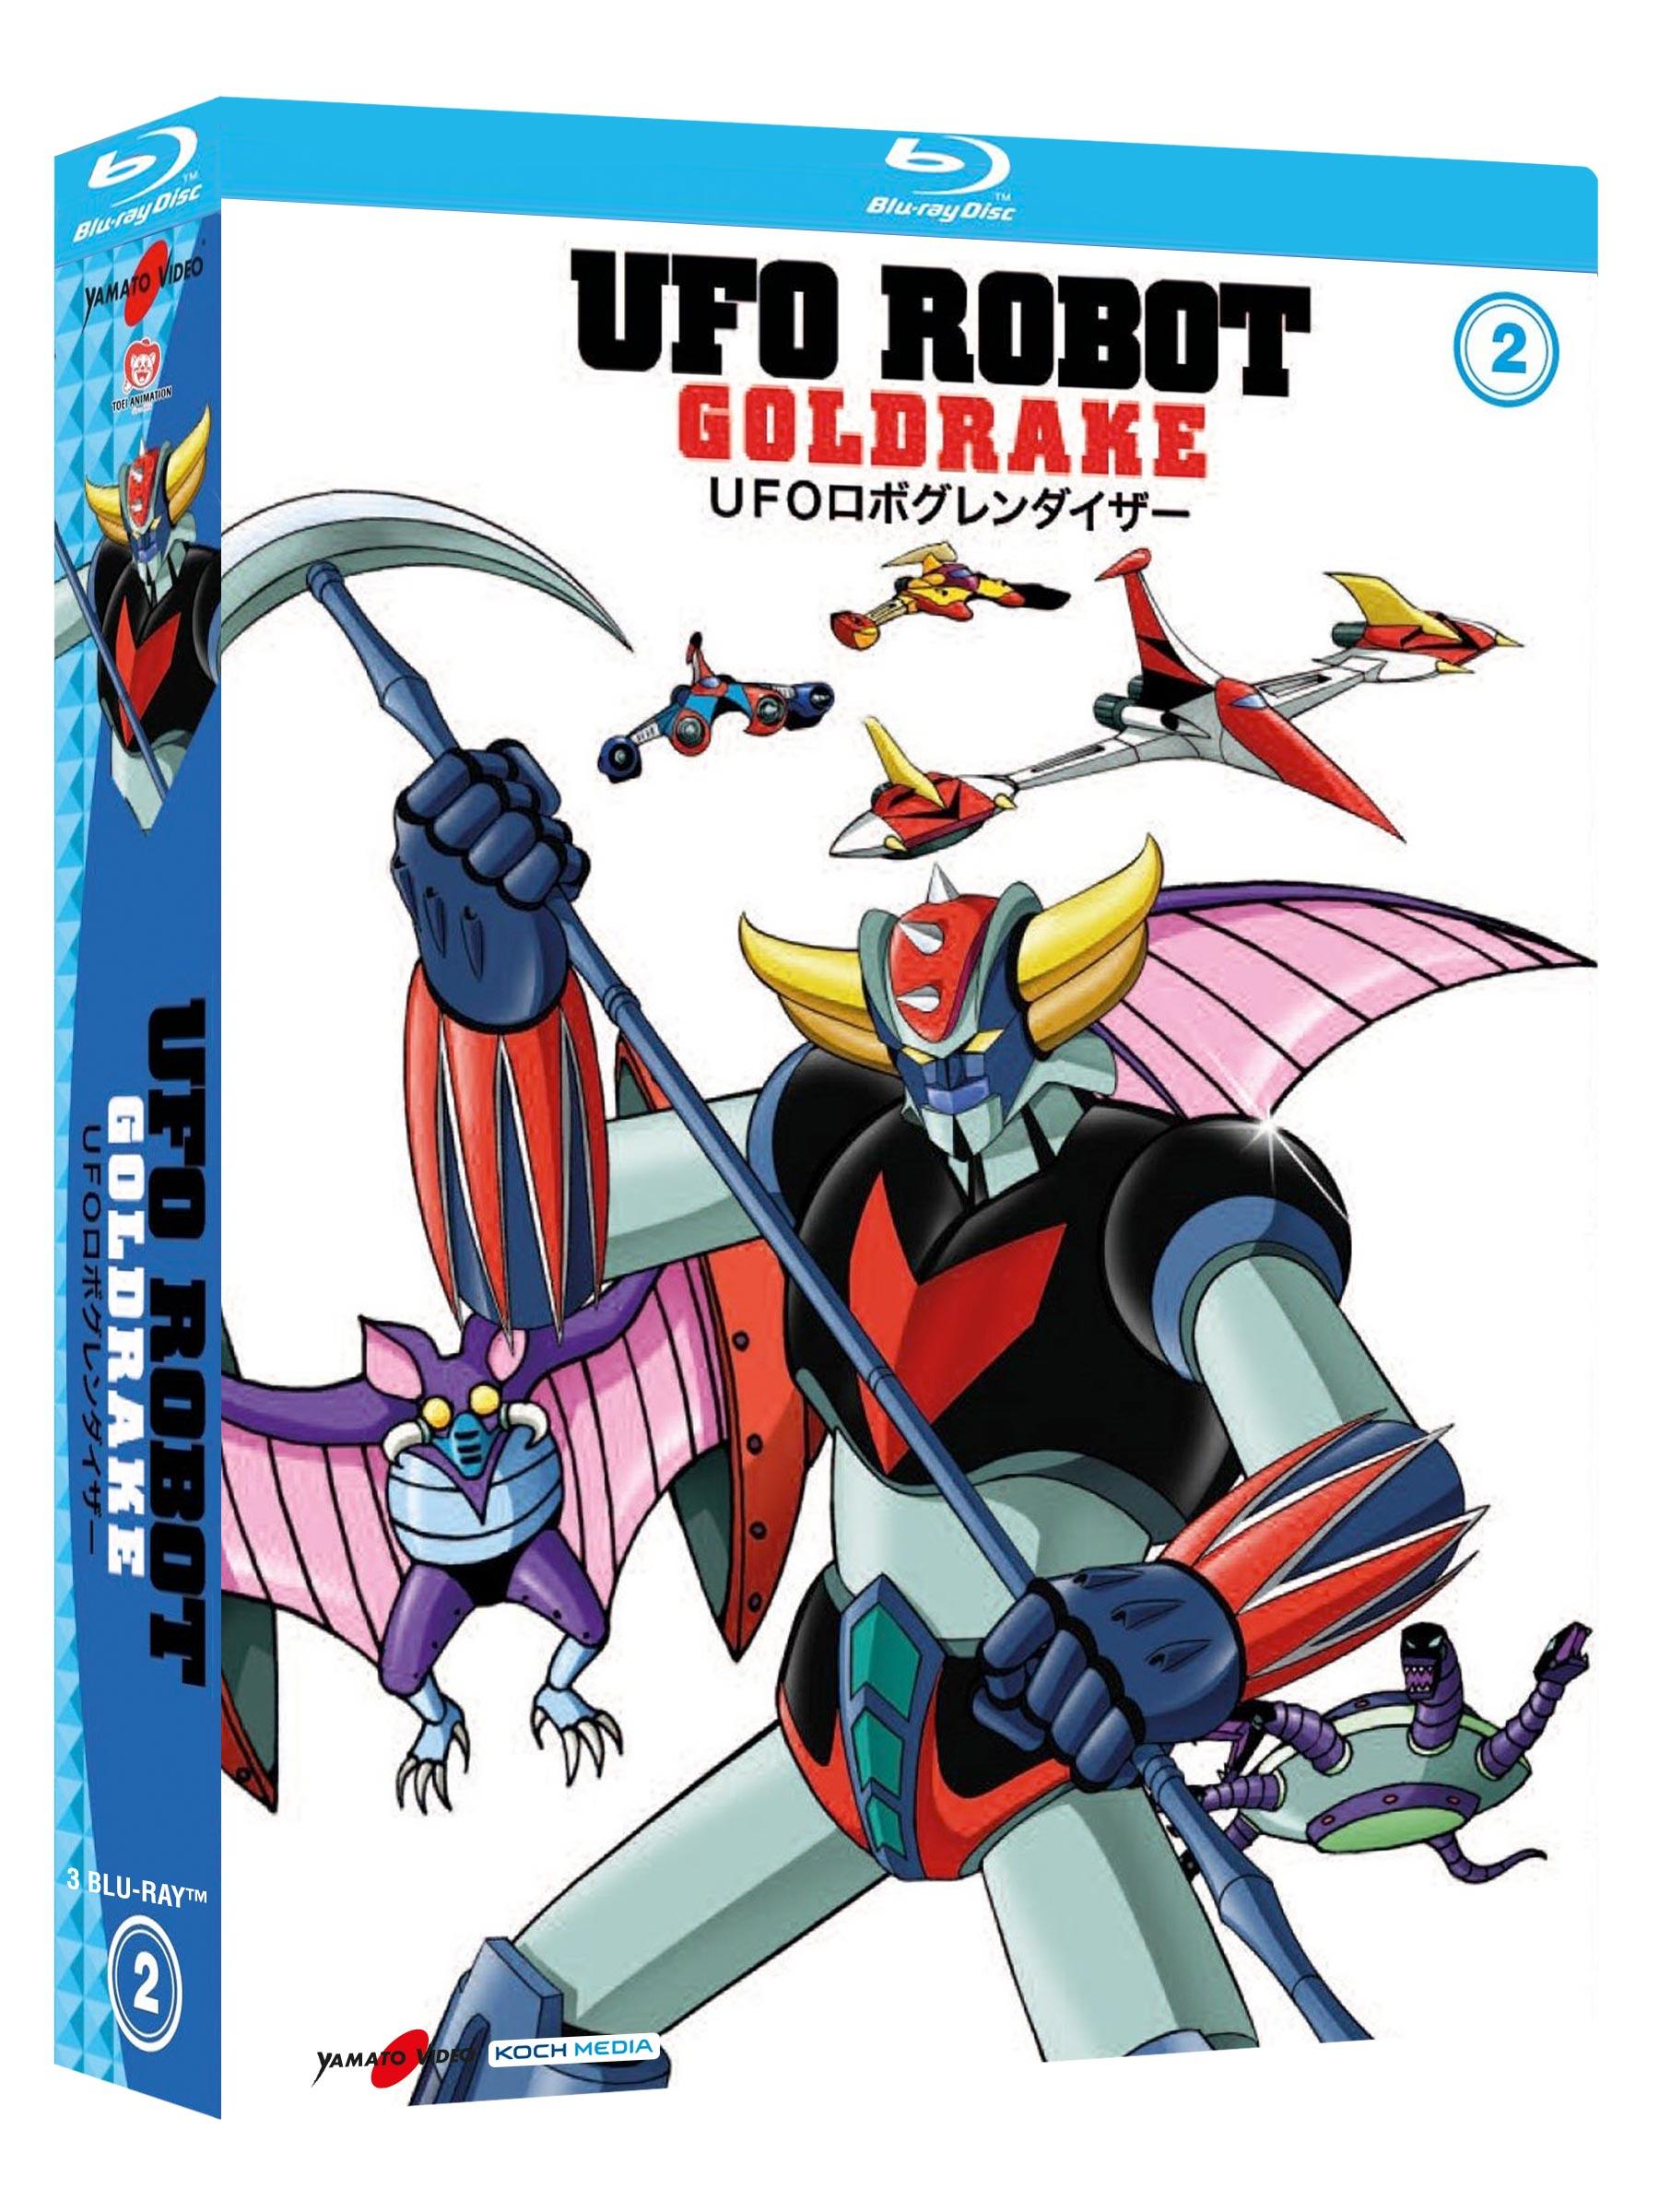 COF.UFO ROBOT GOLDRAKE #02 (3 BLU-RAY)